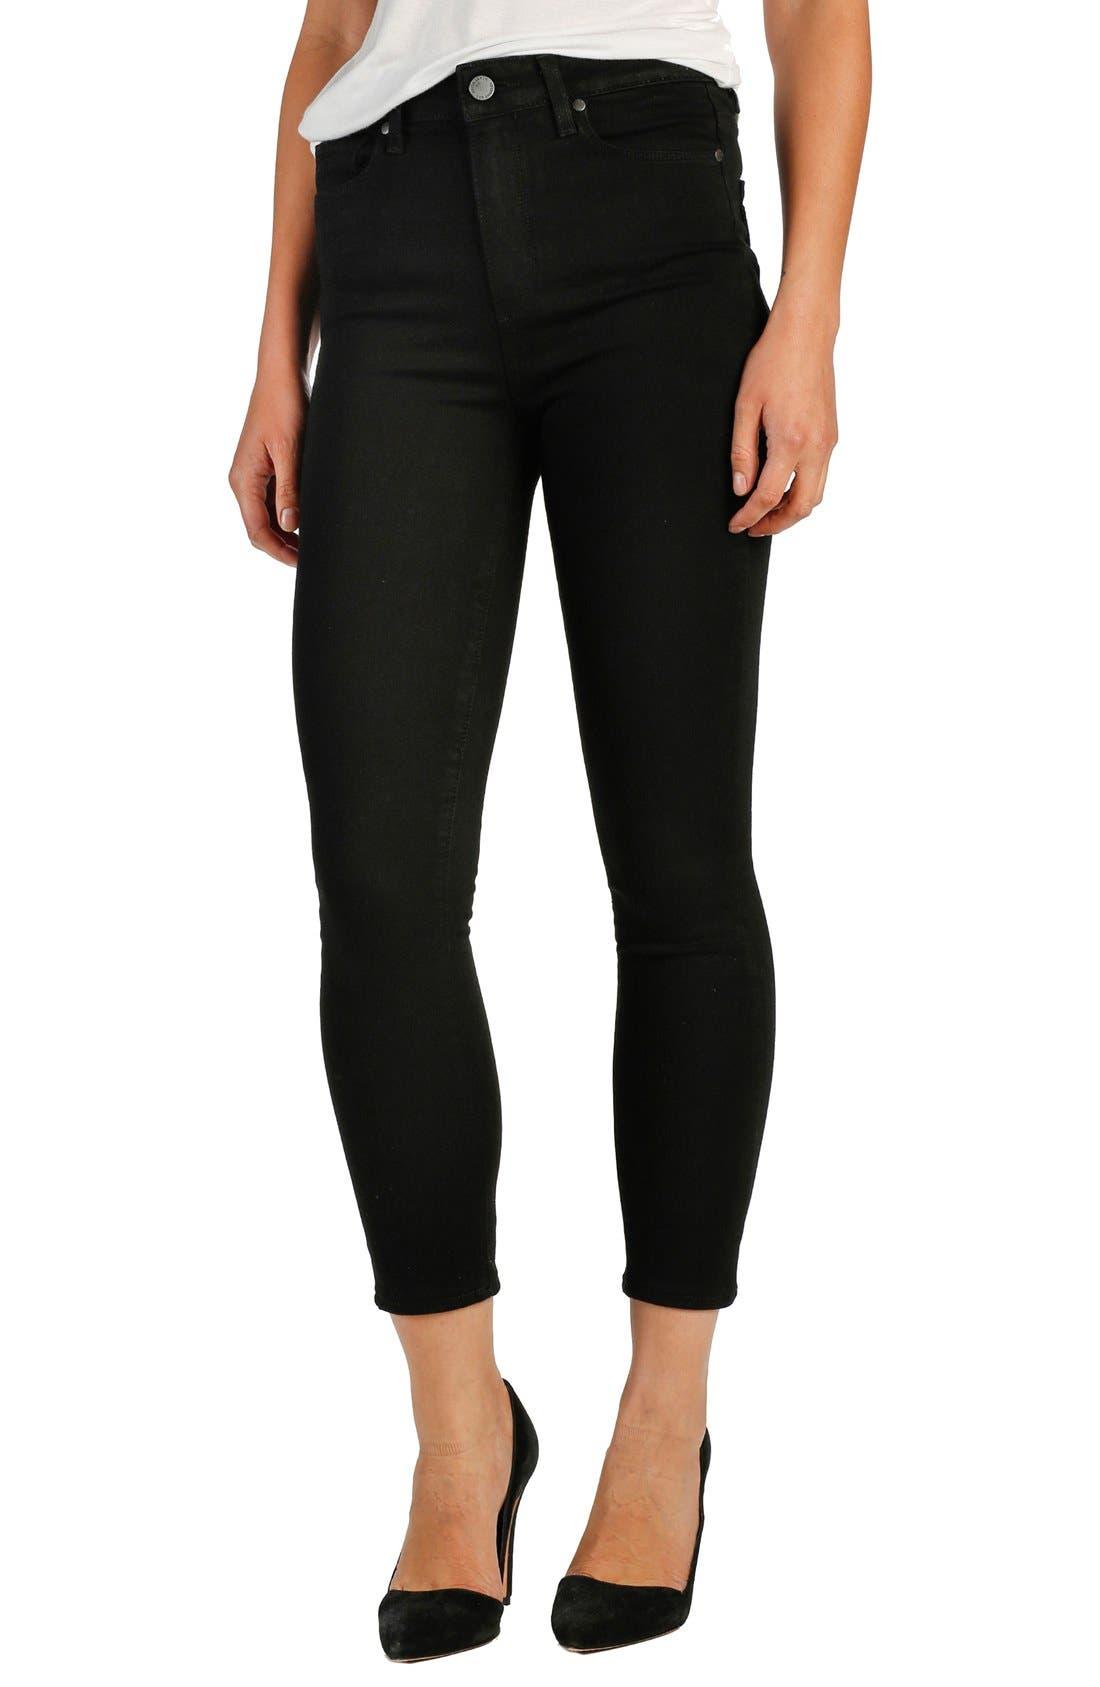 Transcend - Margot High Waist Crop Ultra Skinny Jeans,                             Main thumbnail 1, color,                             001